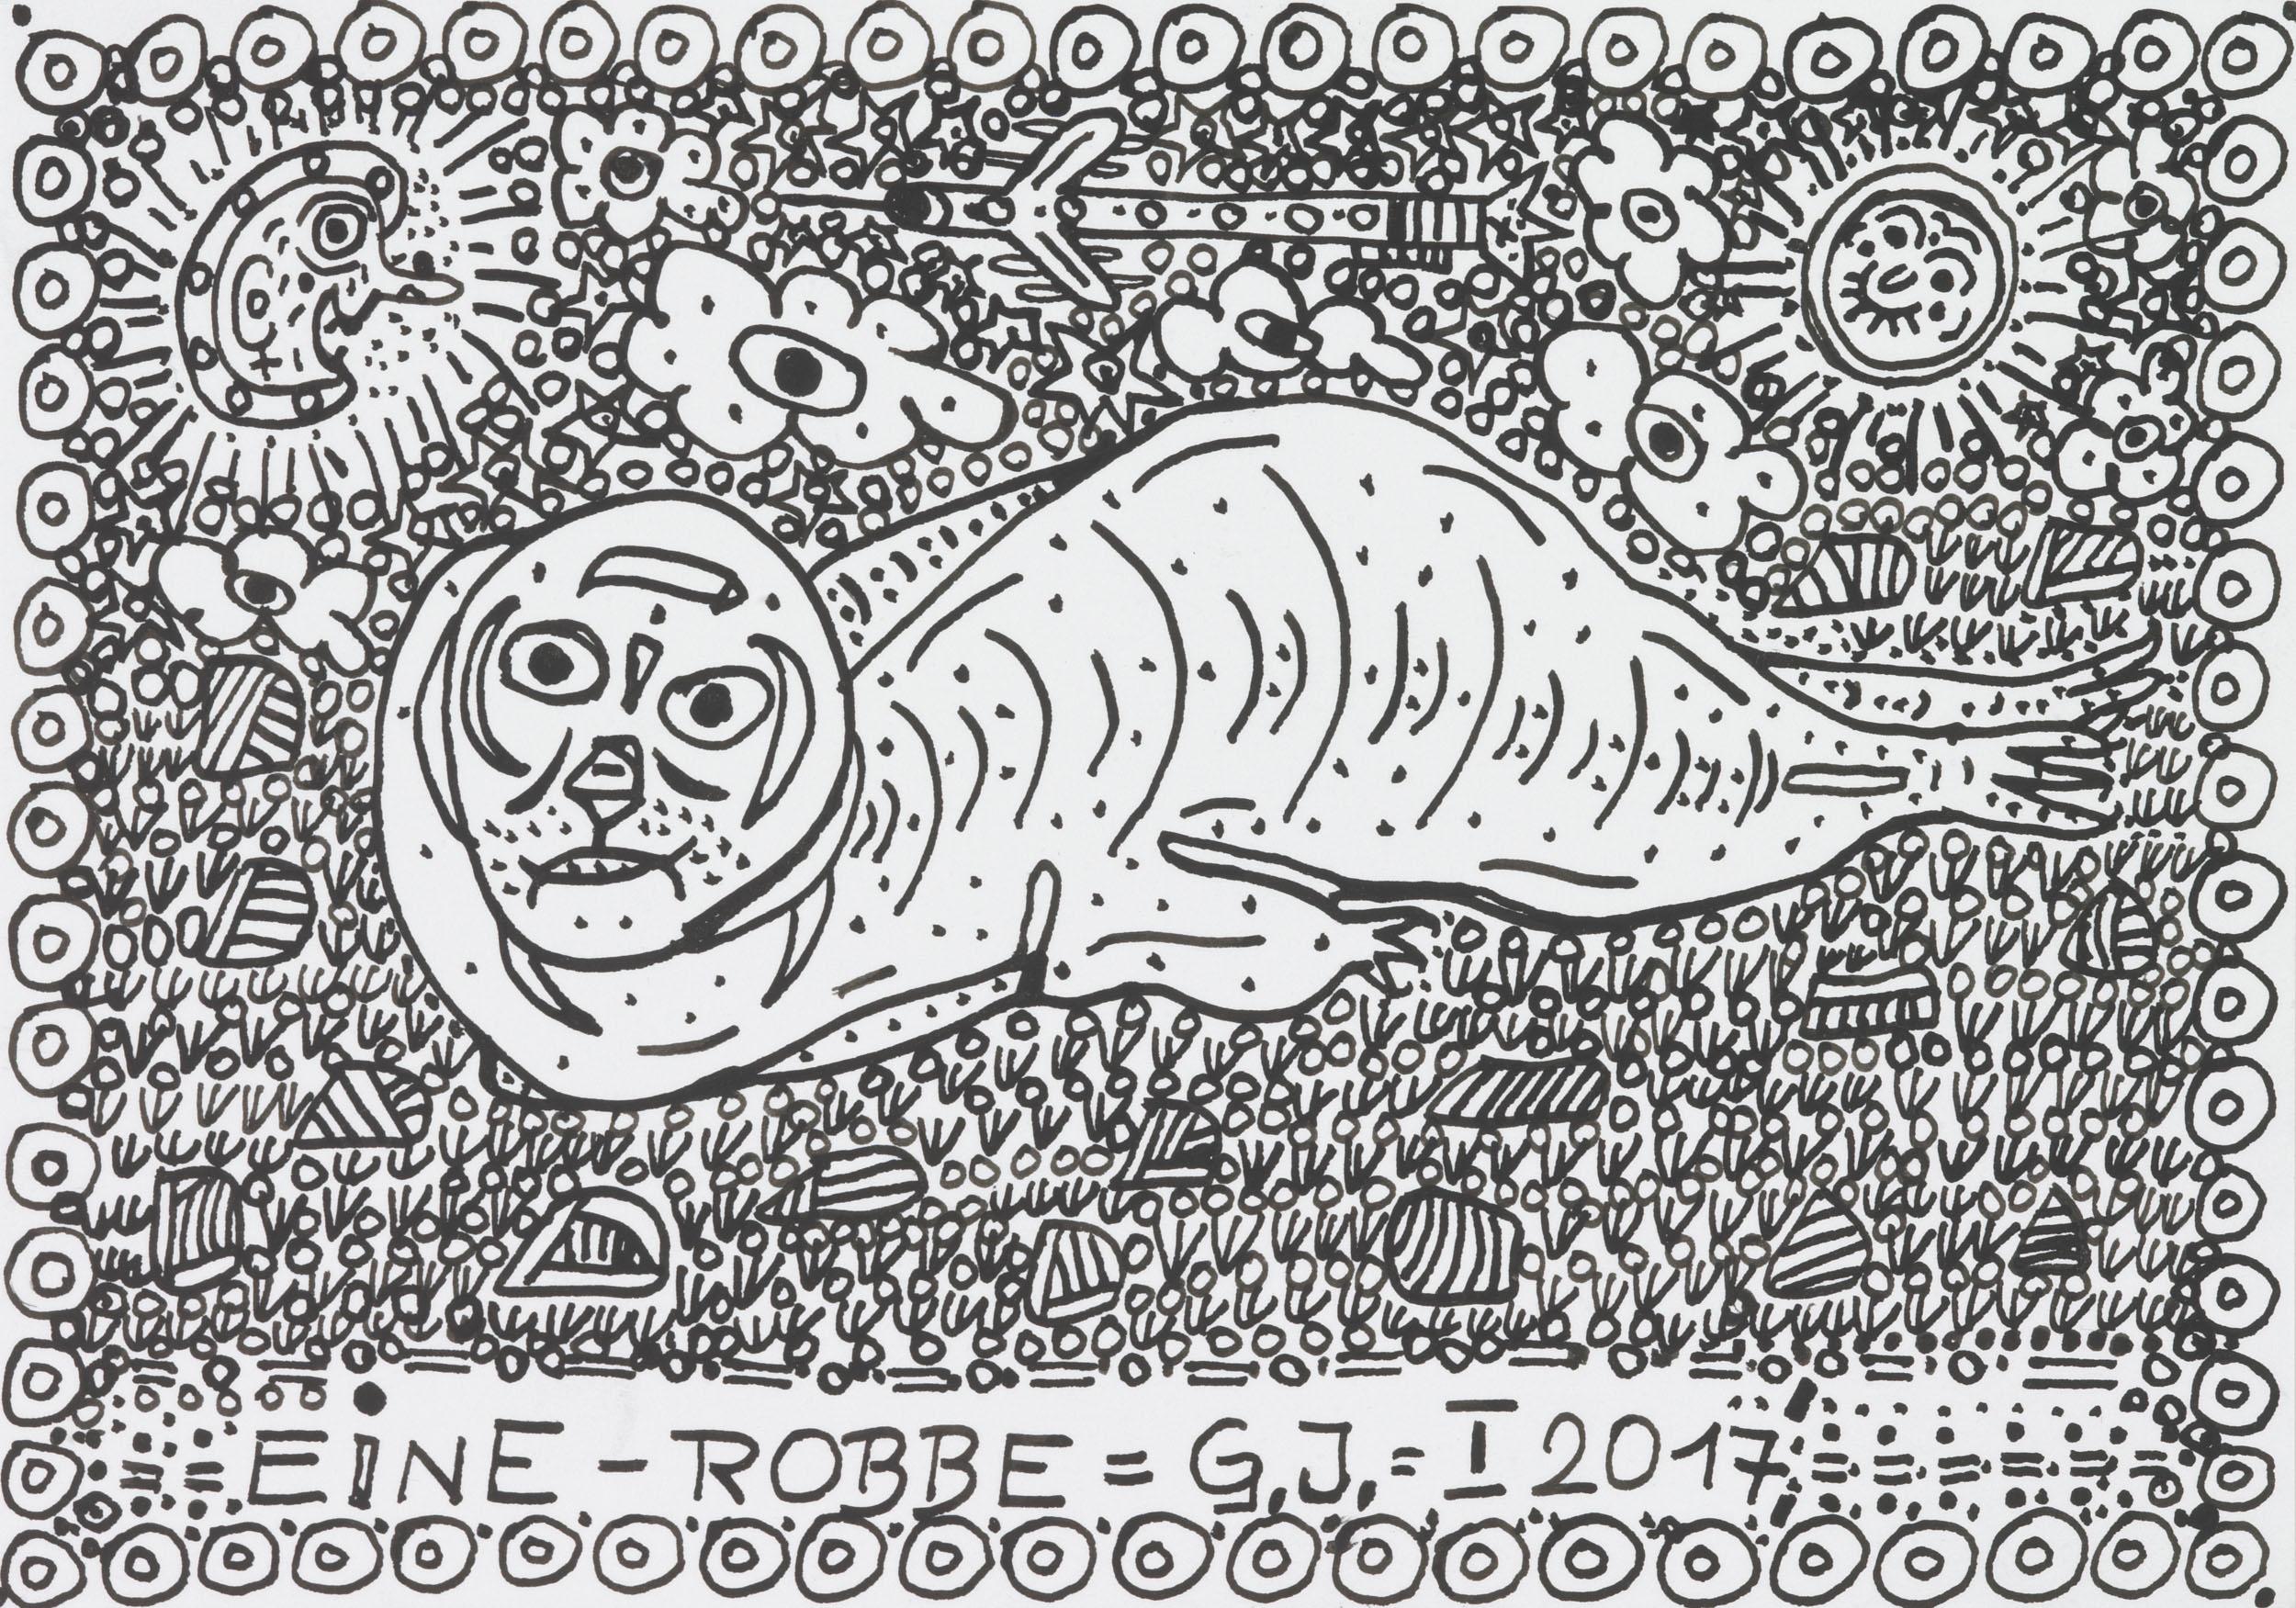 garber johann - EINE-ROBBE / A-SEAL